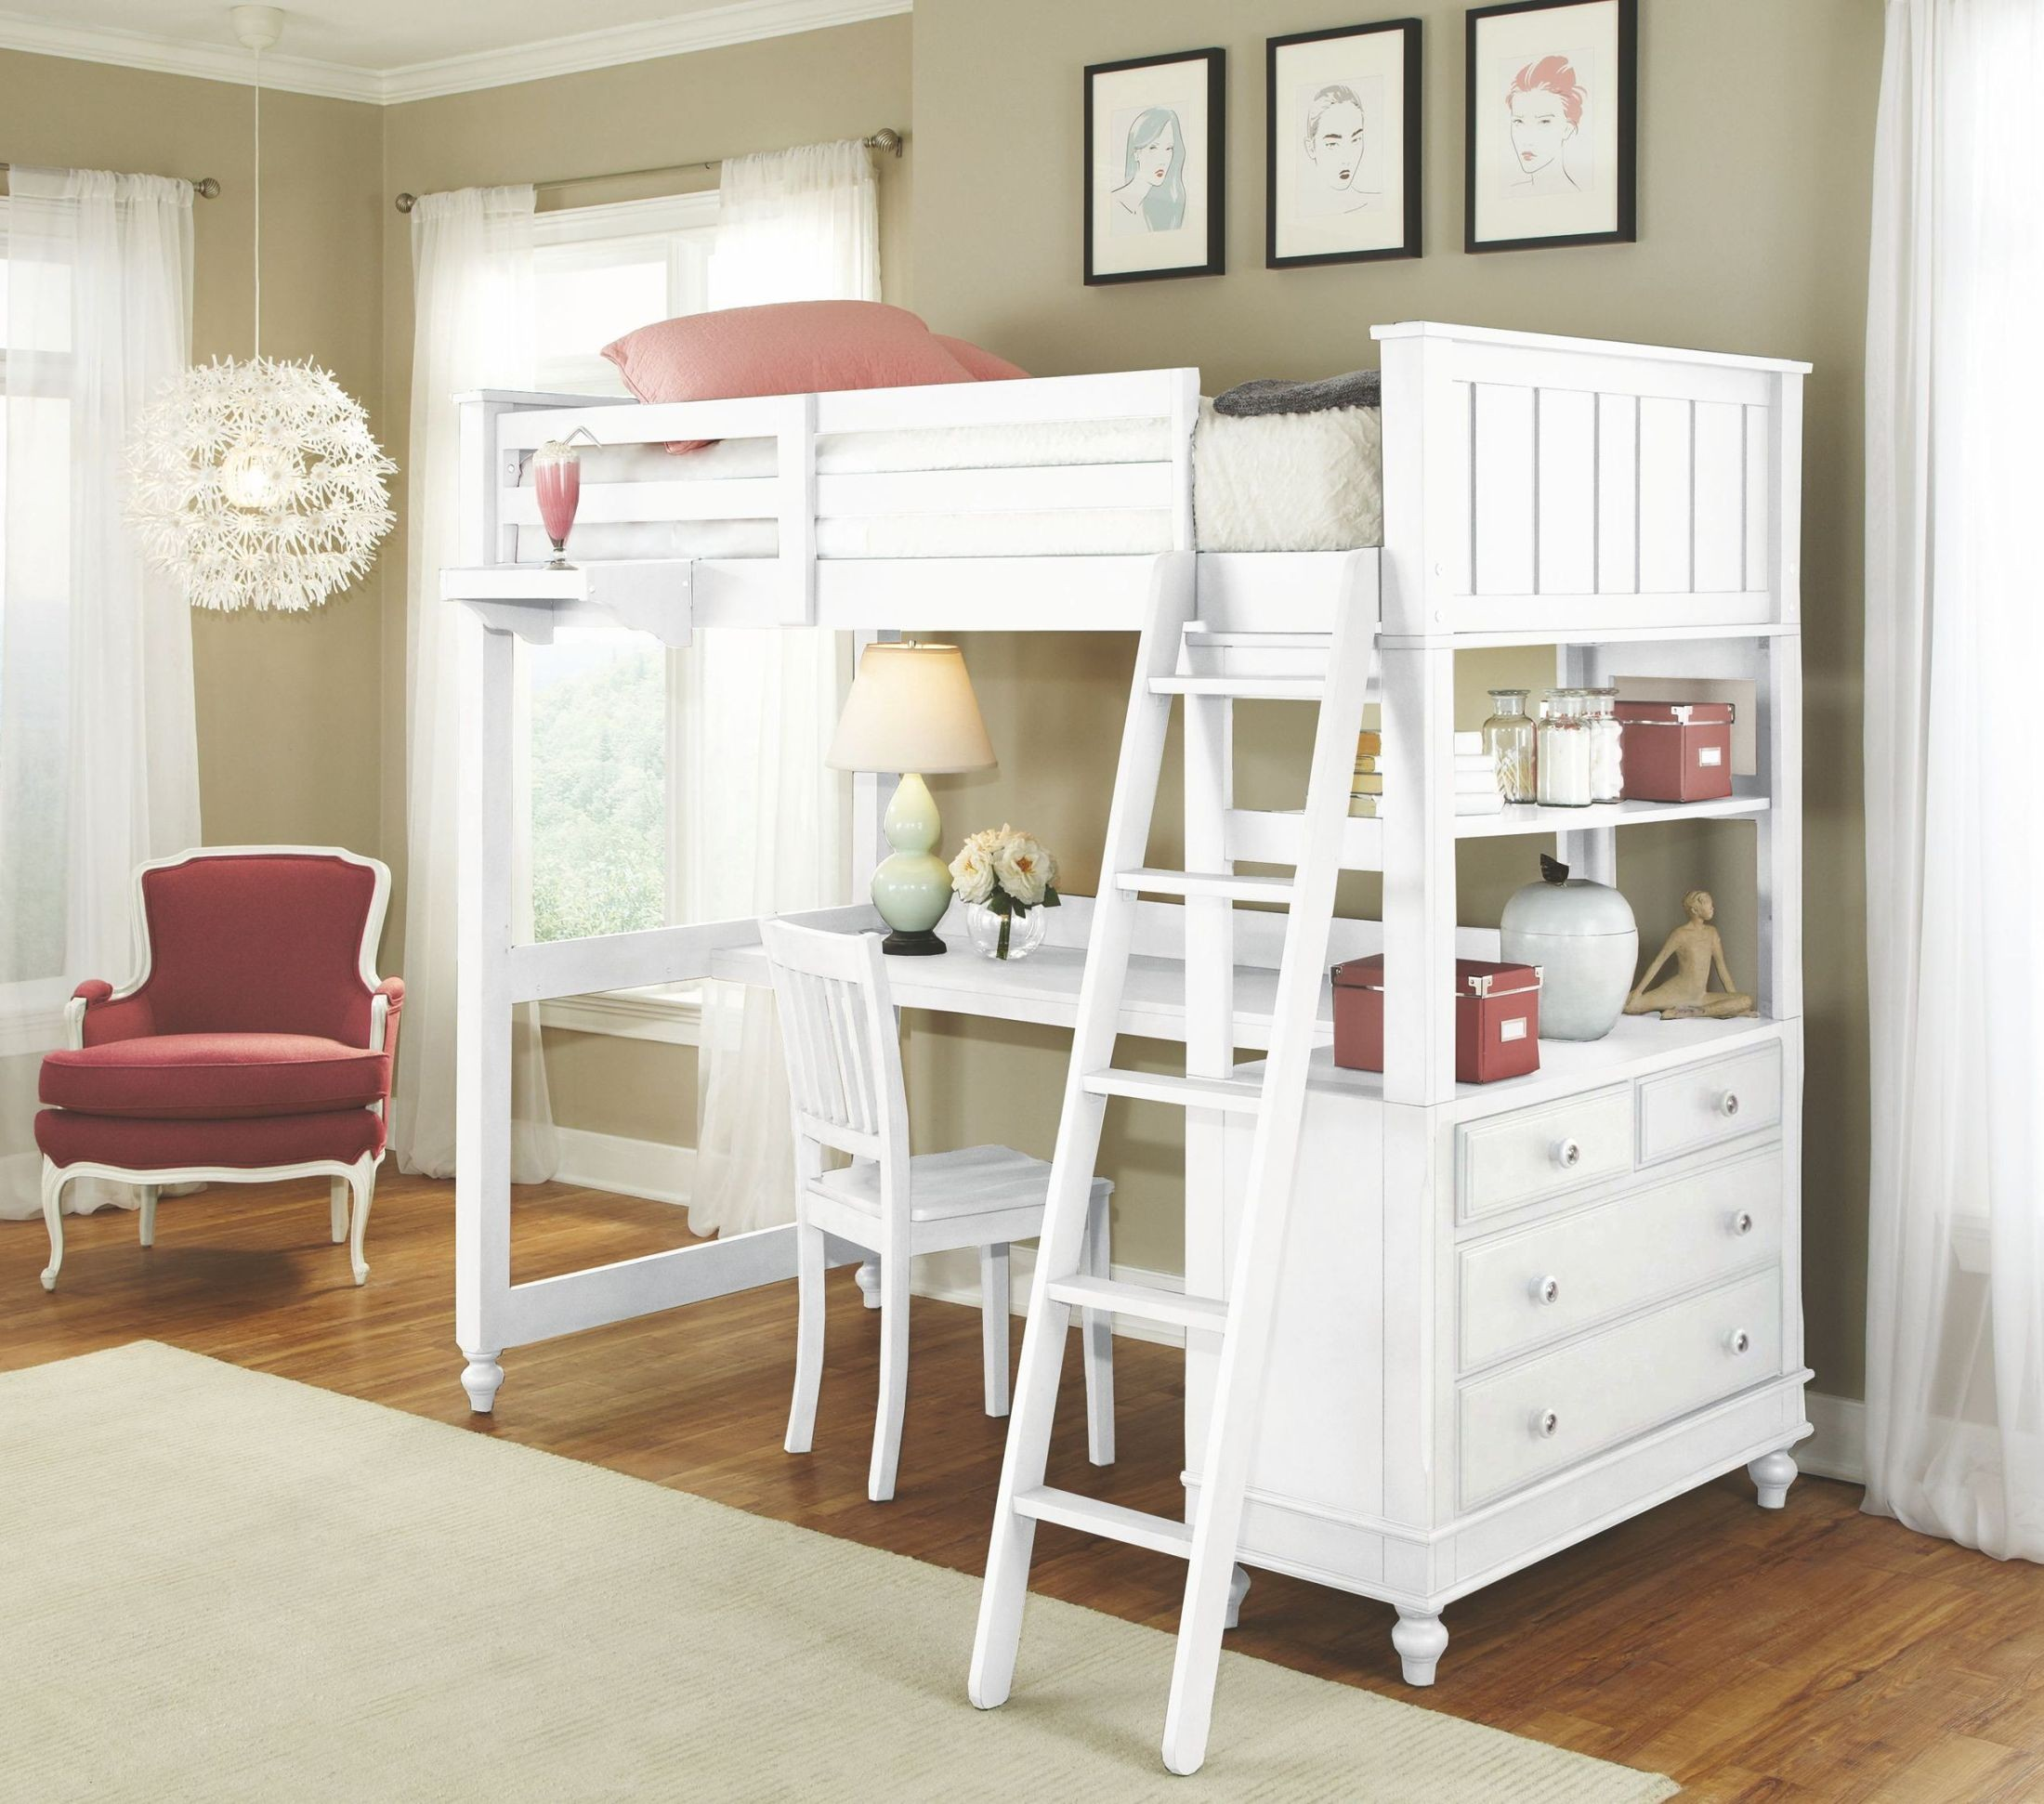 lake house white twin loft bed with desk 1040nd ne kids. Black Bedroom Furniture Sets. Home Design Ideas